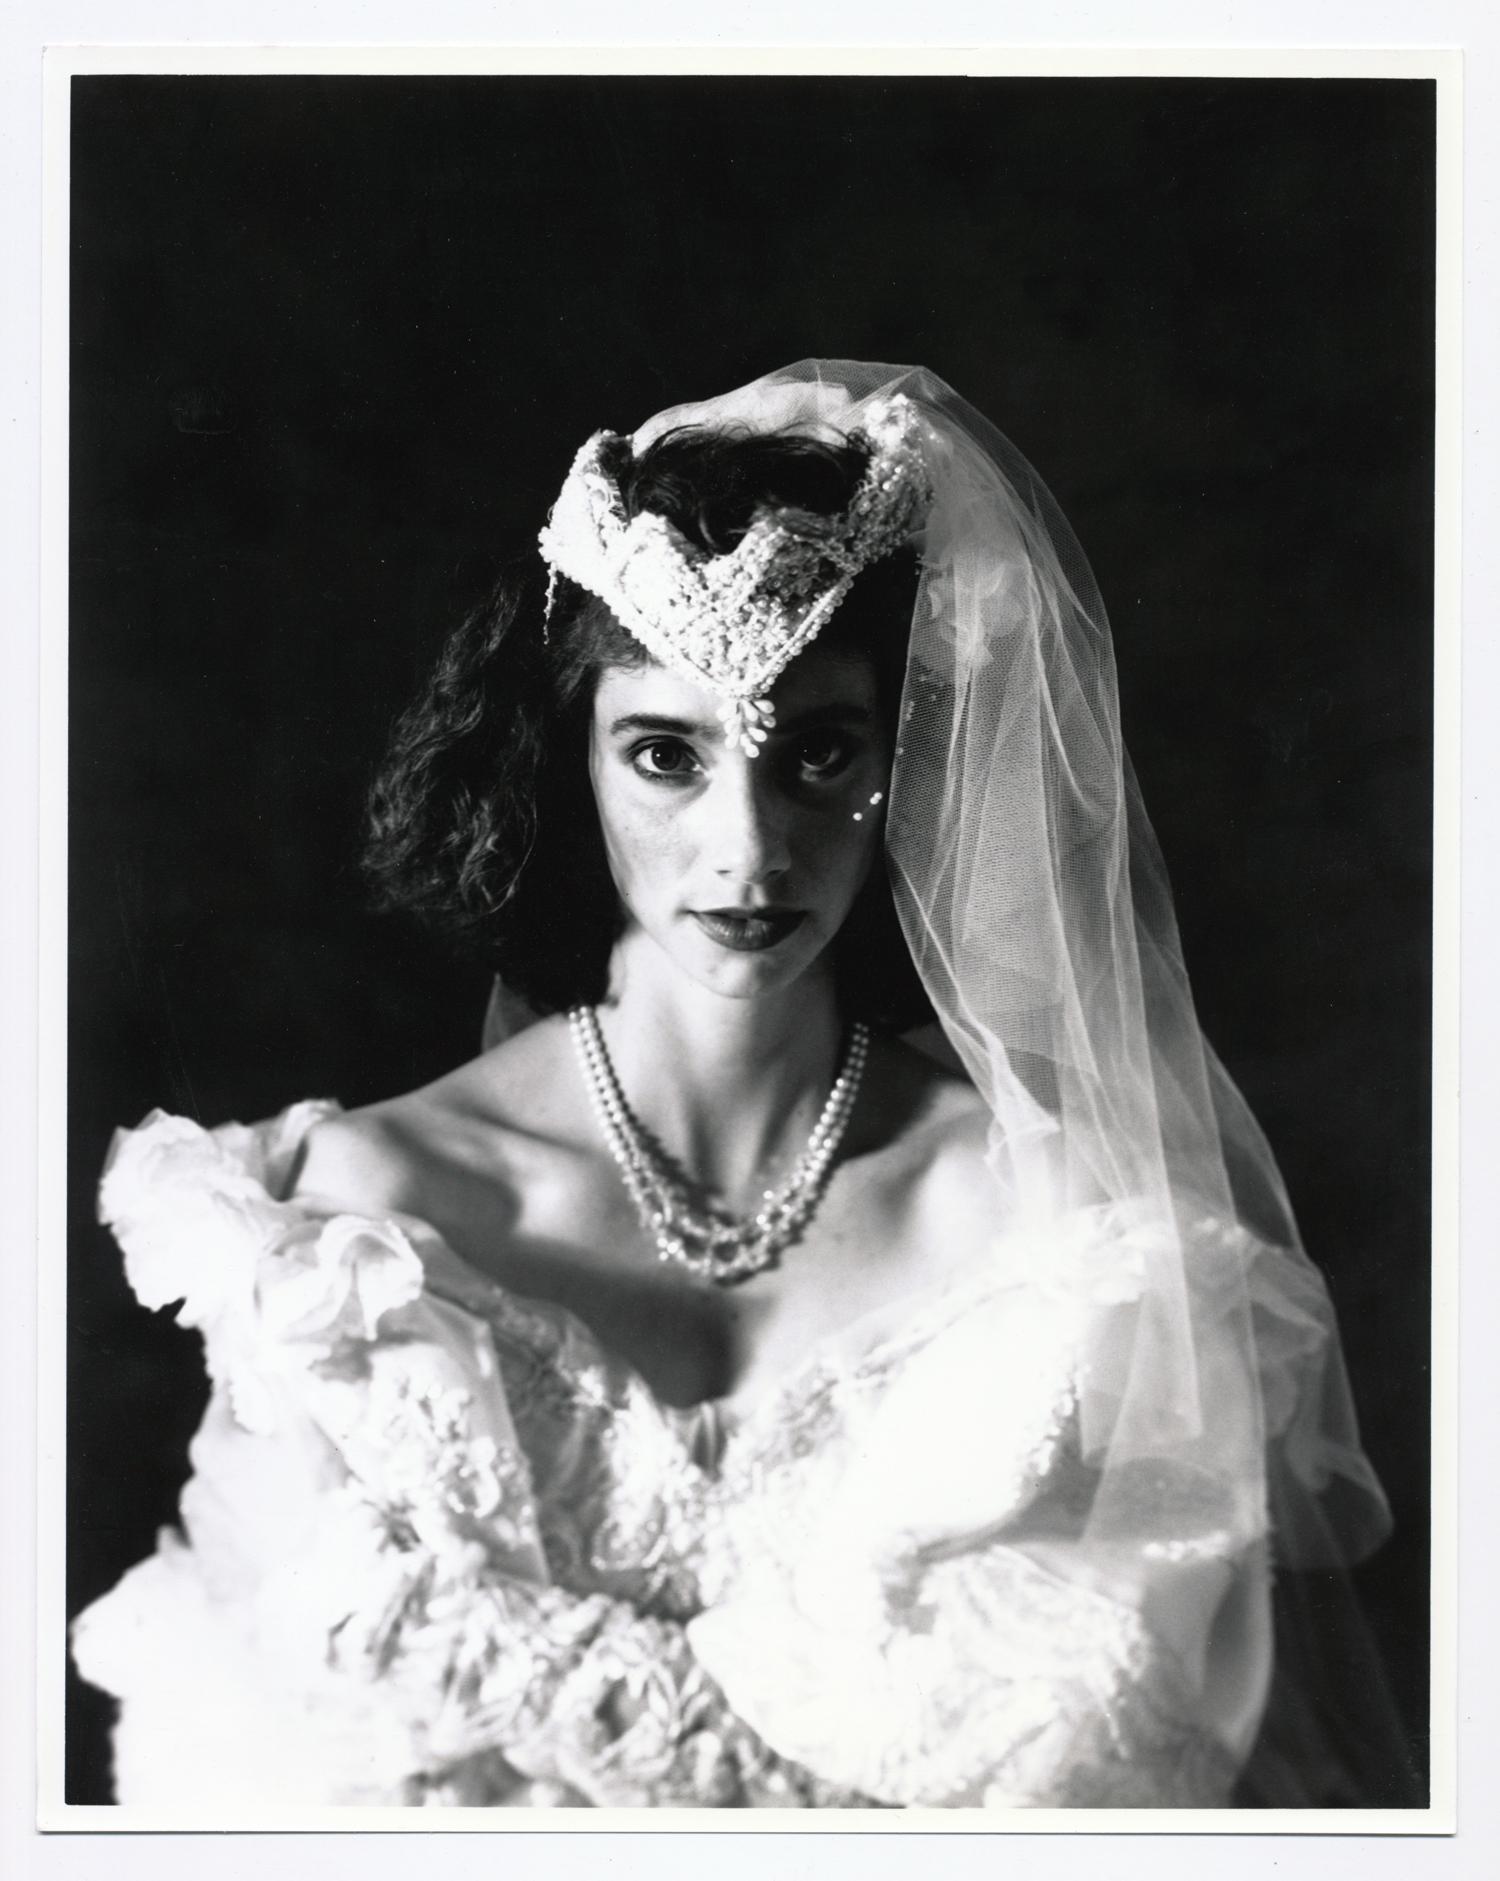 Teresa Wedding Series   4x5 silver print. © Jud Burgess 1989